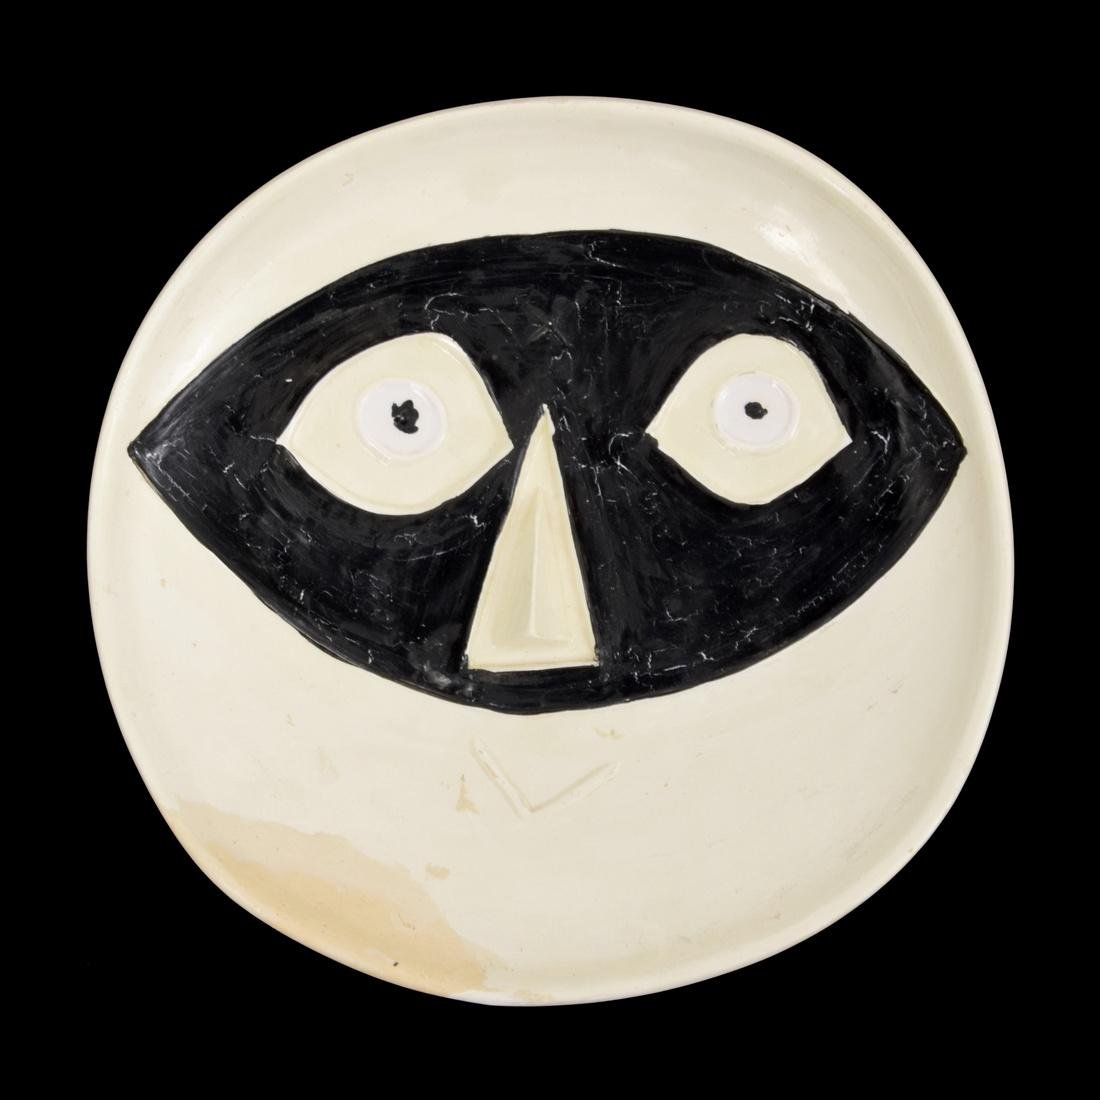 Pablo Picasso TETE AU MASQUE Plate (A.R. 362)